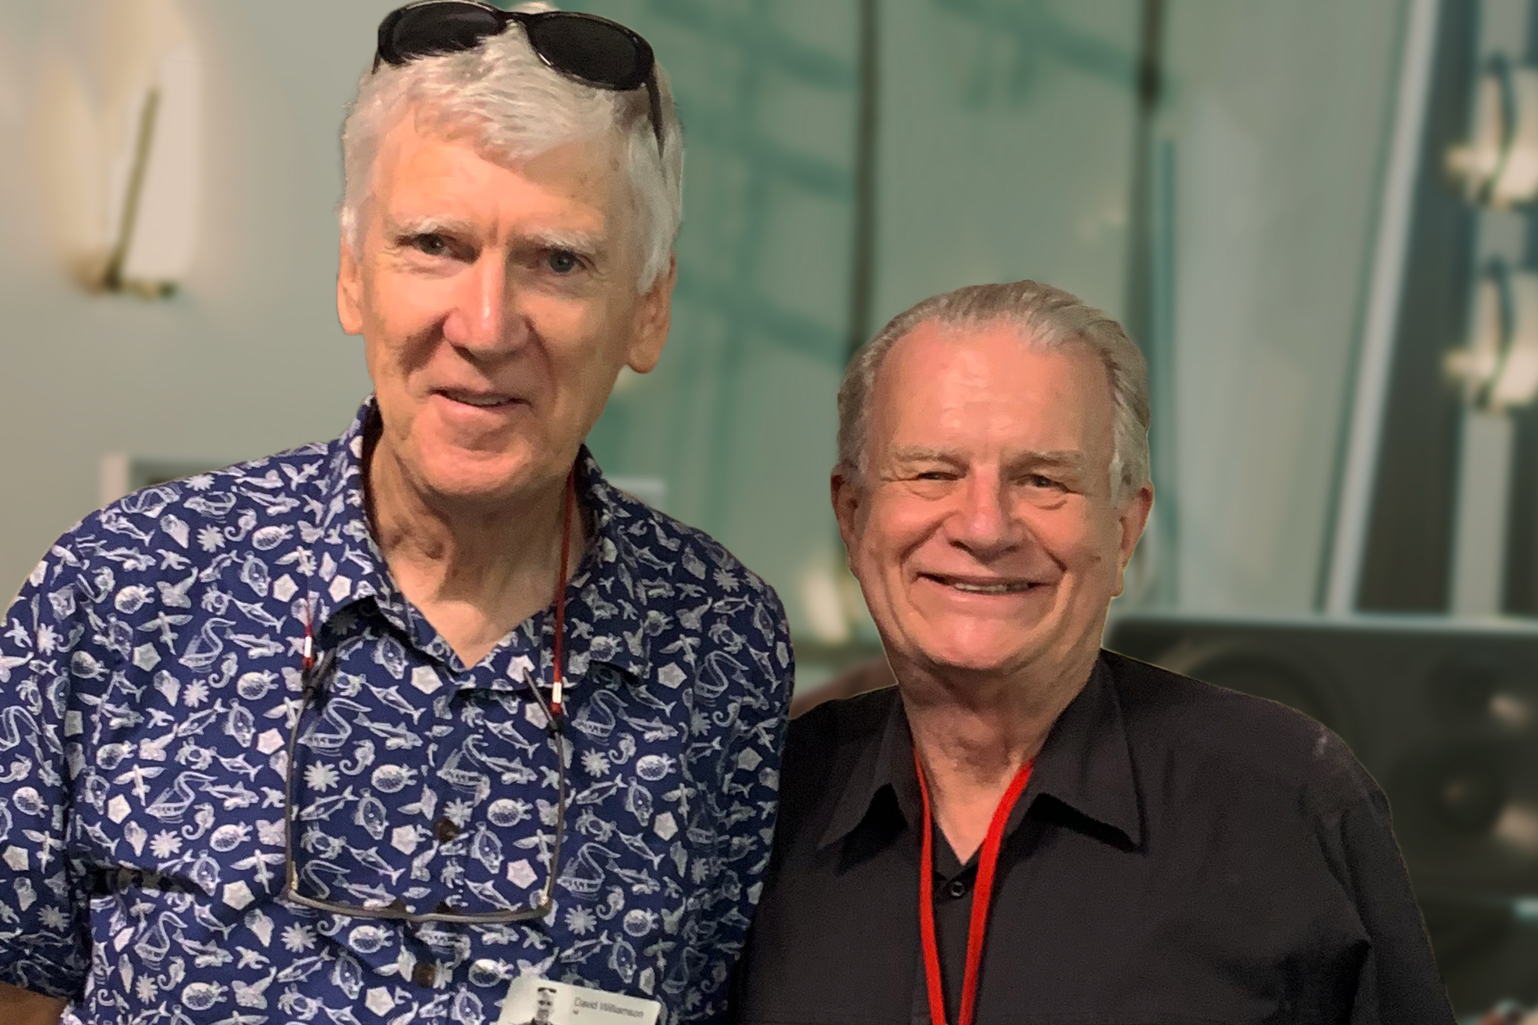 David Williamson & Rev. Bill Crews